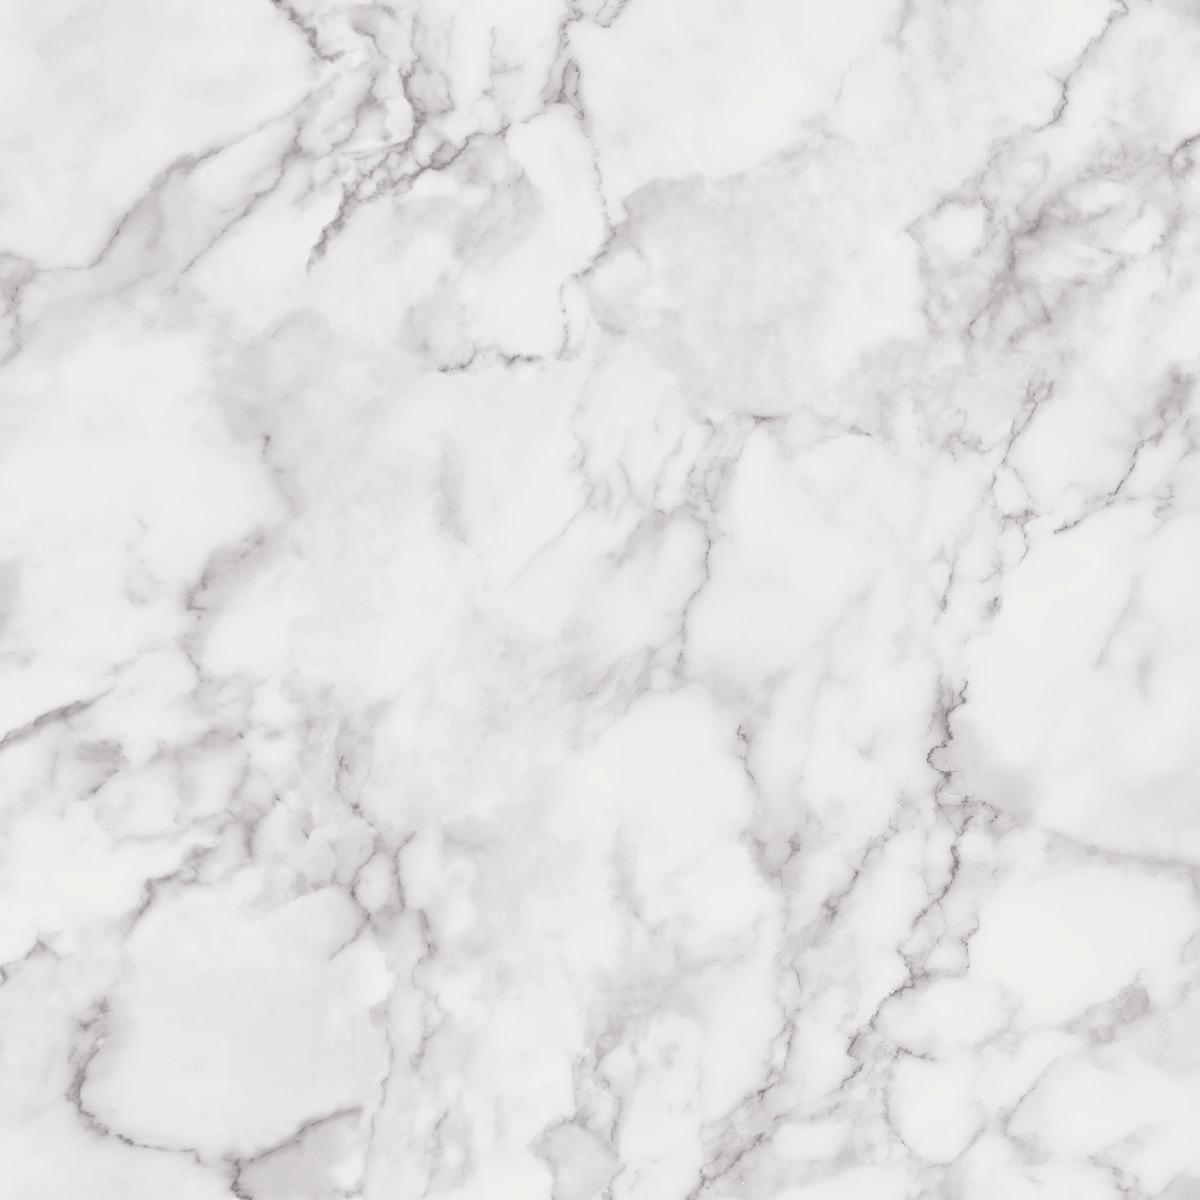 Marblesque Plain Marble Wallpaper White Fine Decor Fd42274